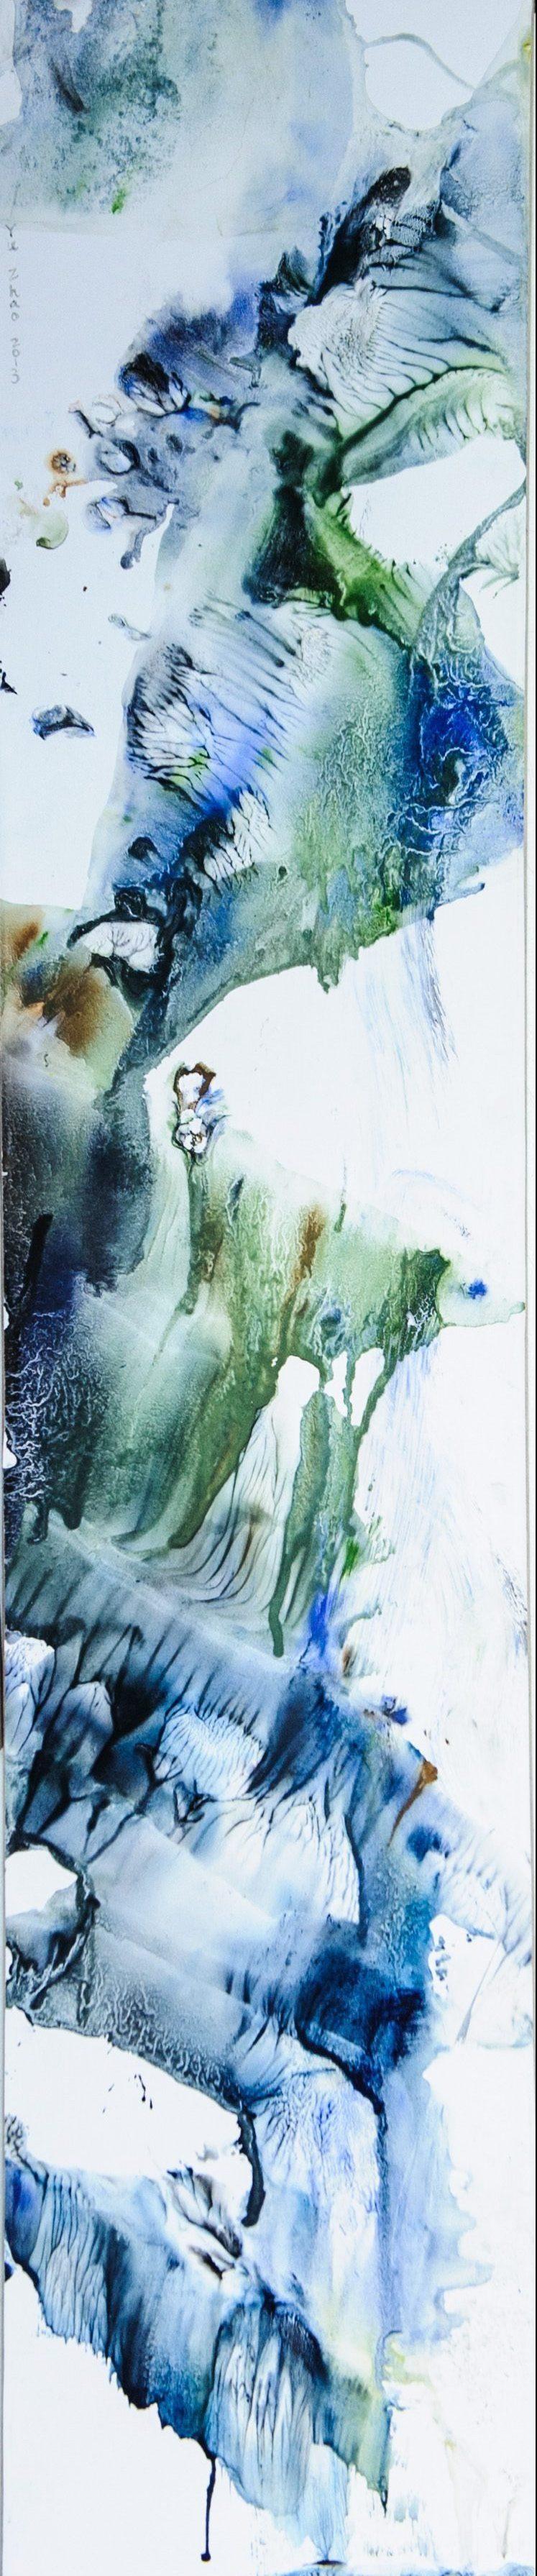 Yu Zhao, Cascade, tempera/paper/canvas, 130x25cm, 2013, private collection